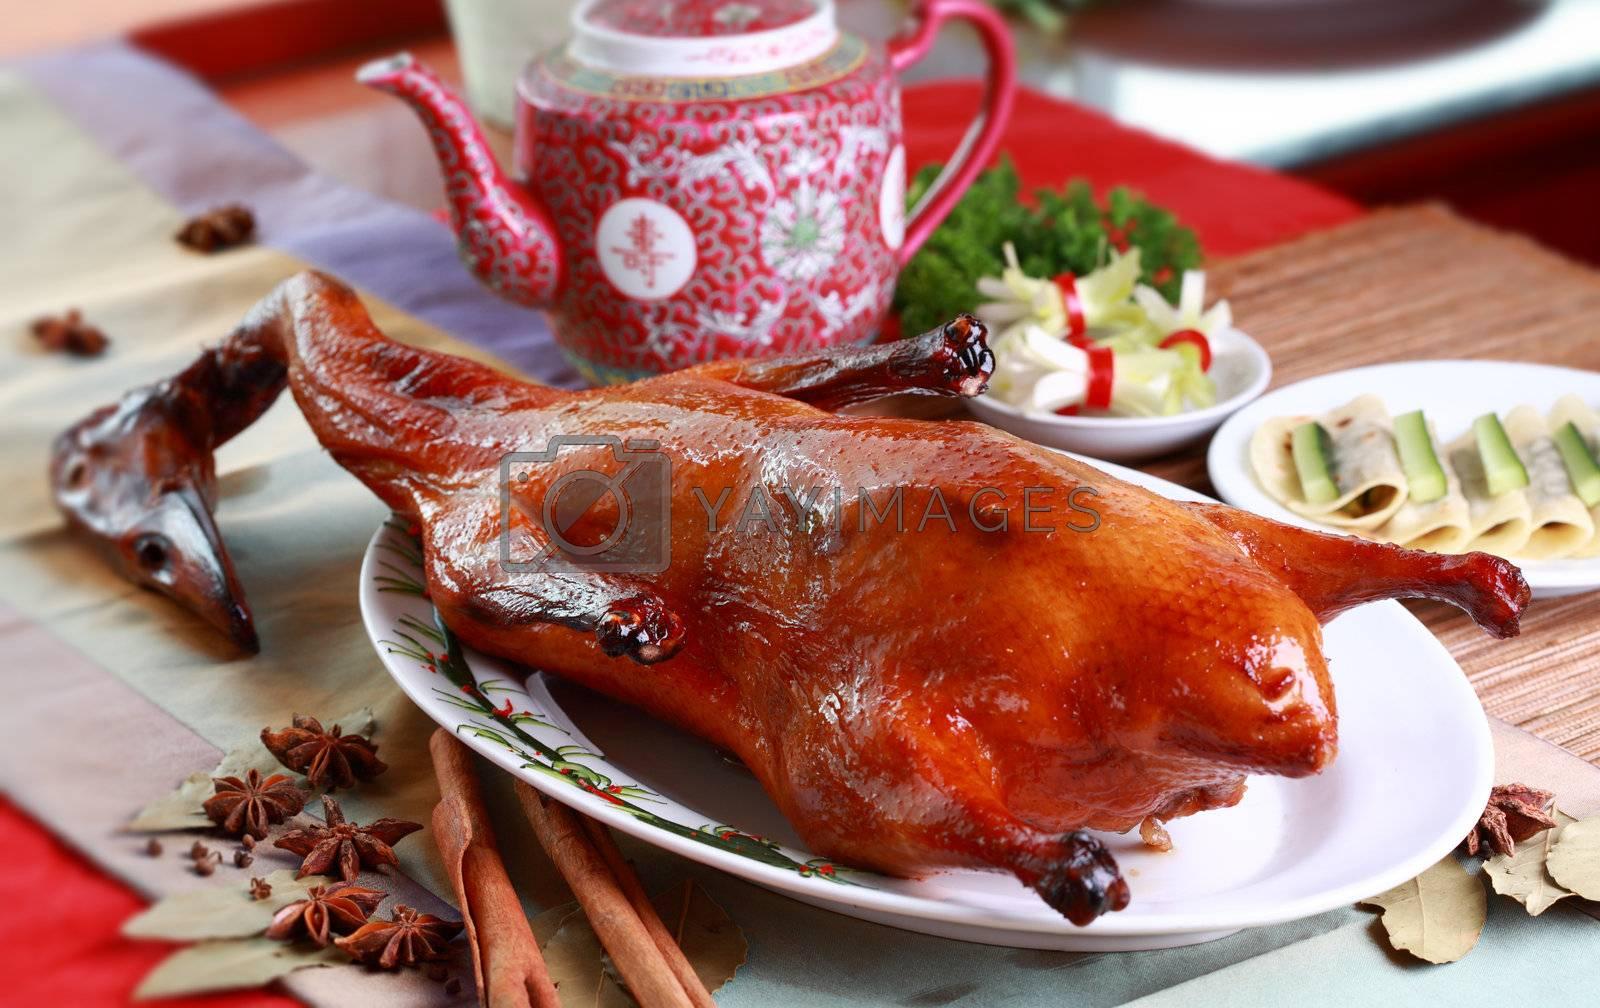 Peking Duck, China's most famous dish